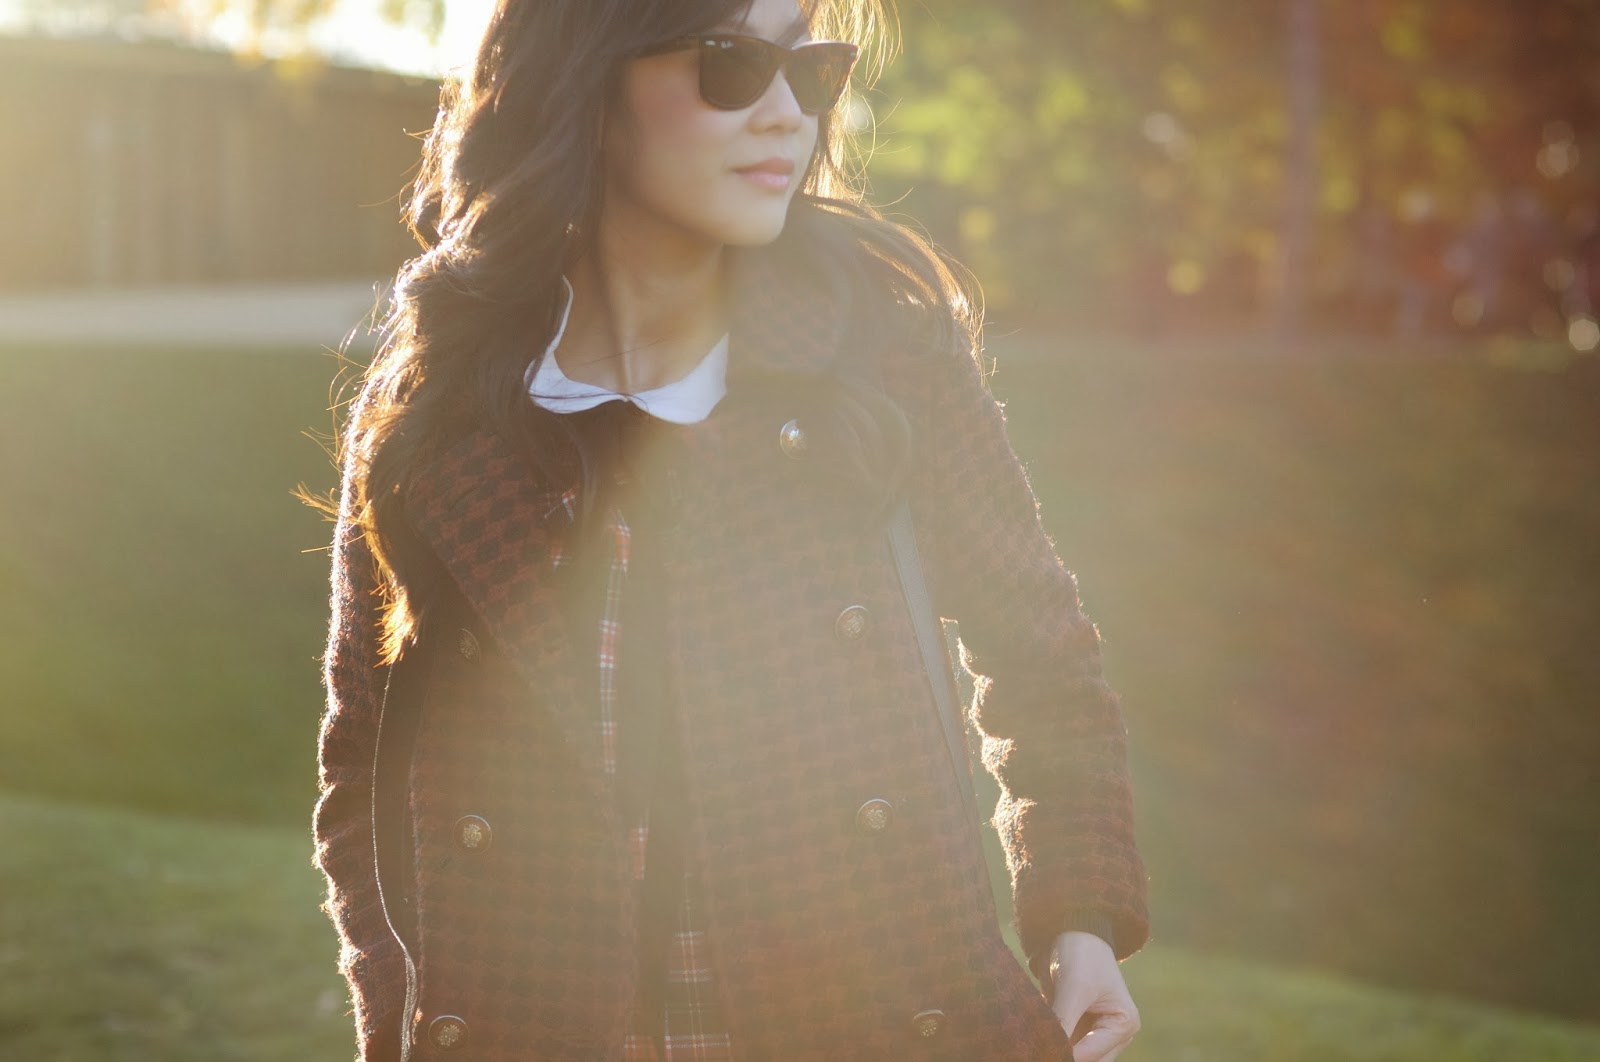 winter style tips, winter style ideas, winter fashion